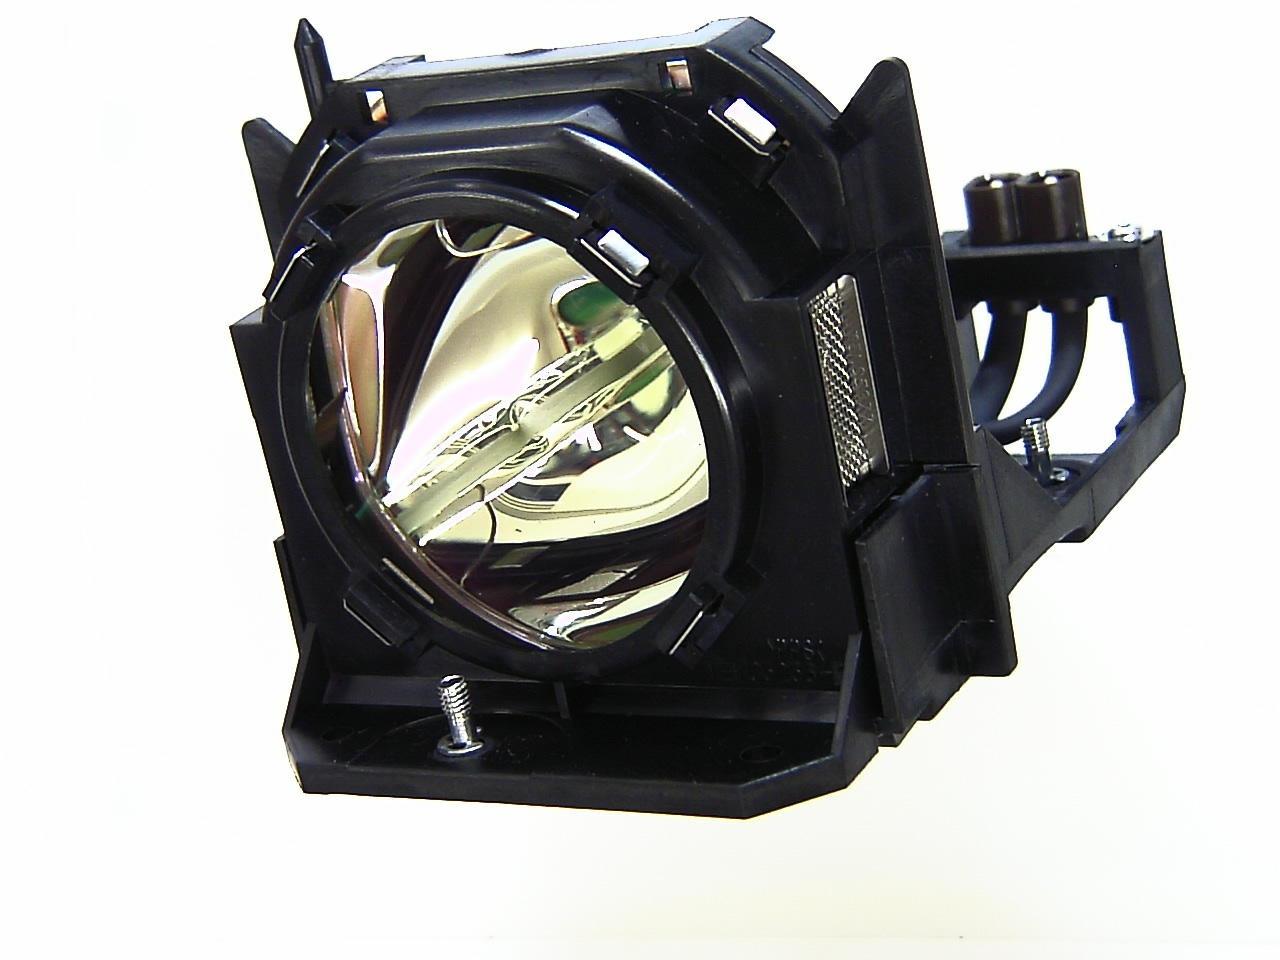 Original Quad Lámpara For PANASONIC PT-DW10000 Proyector.